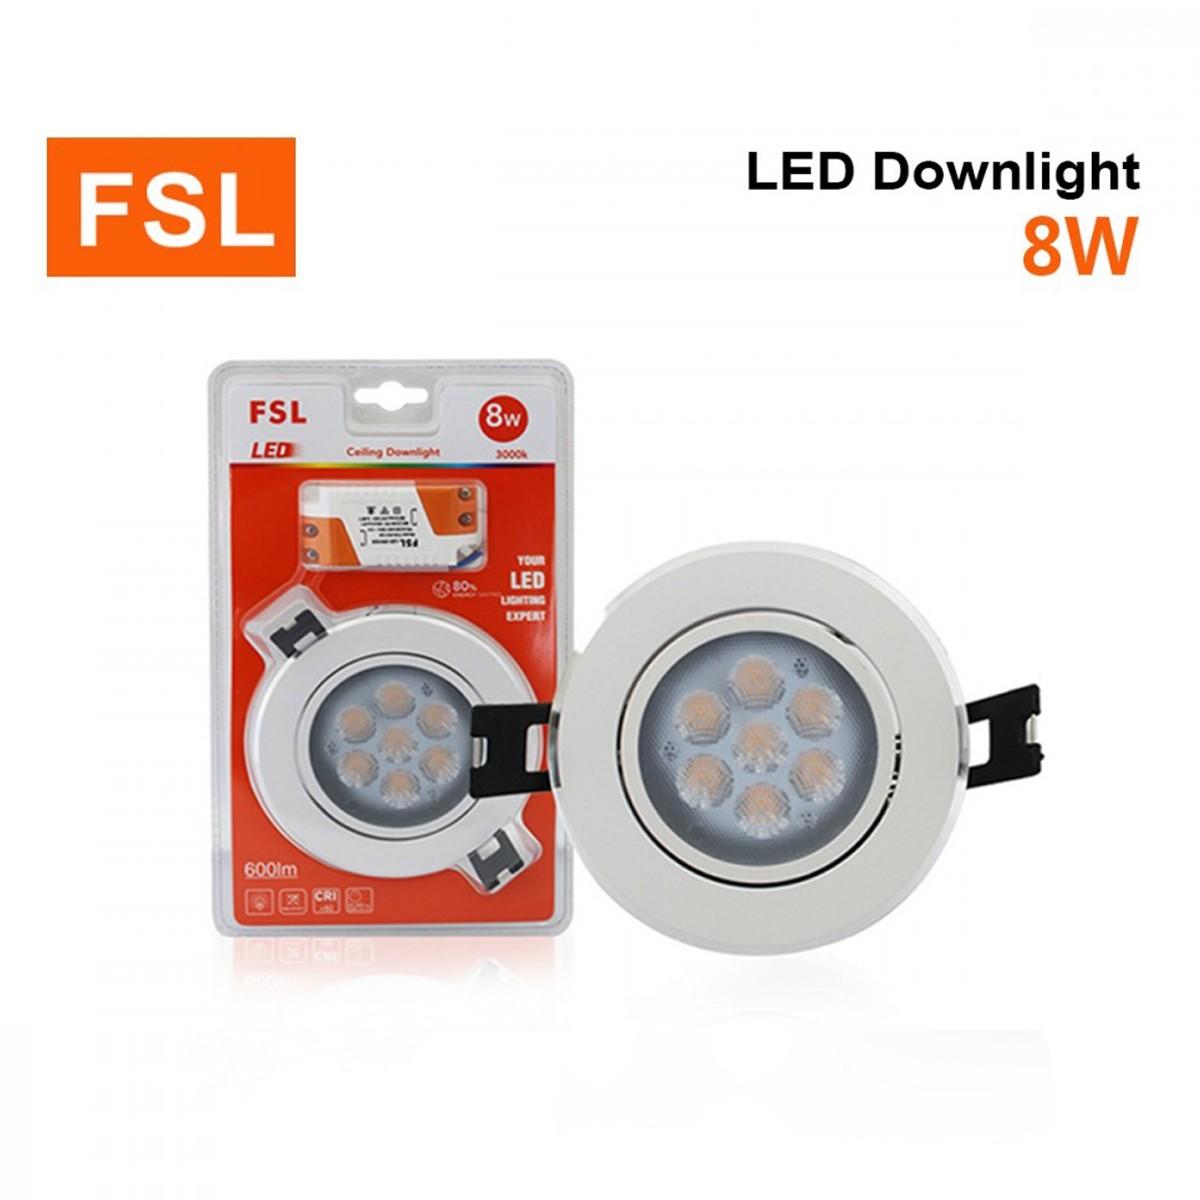 FSL 8w